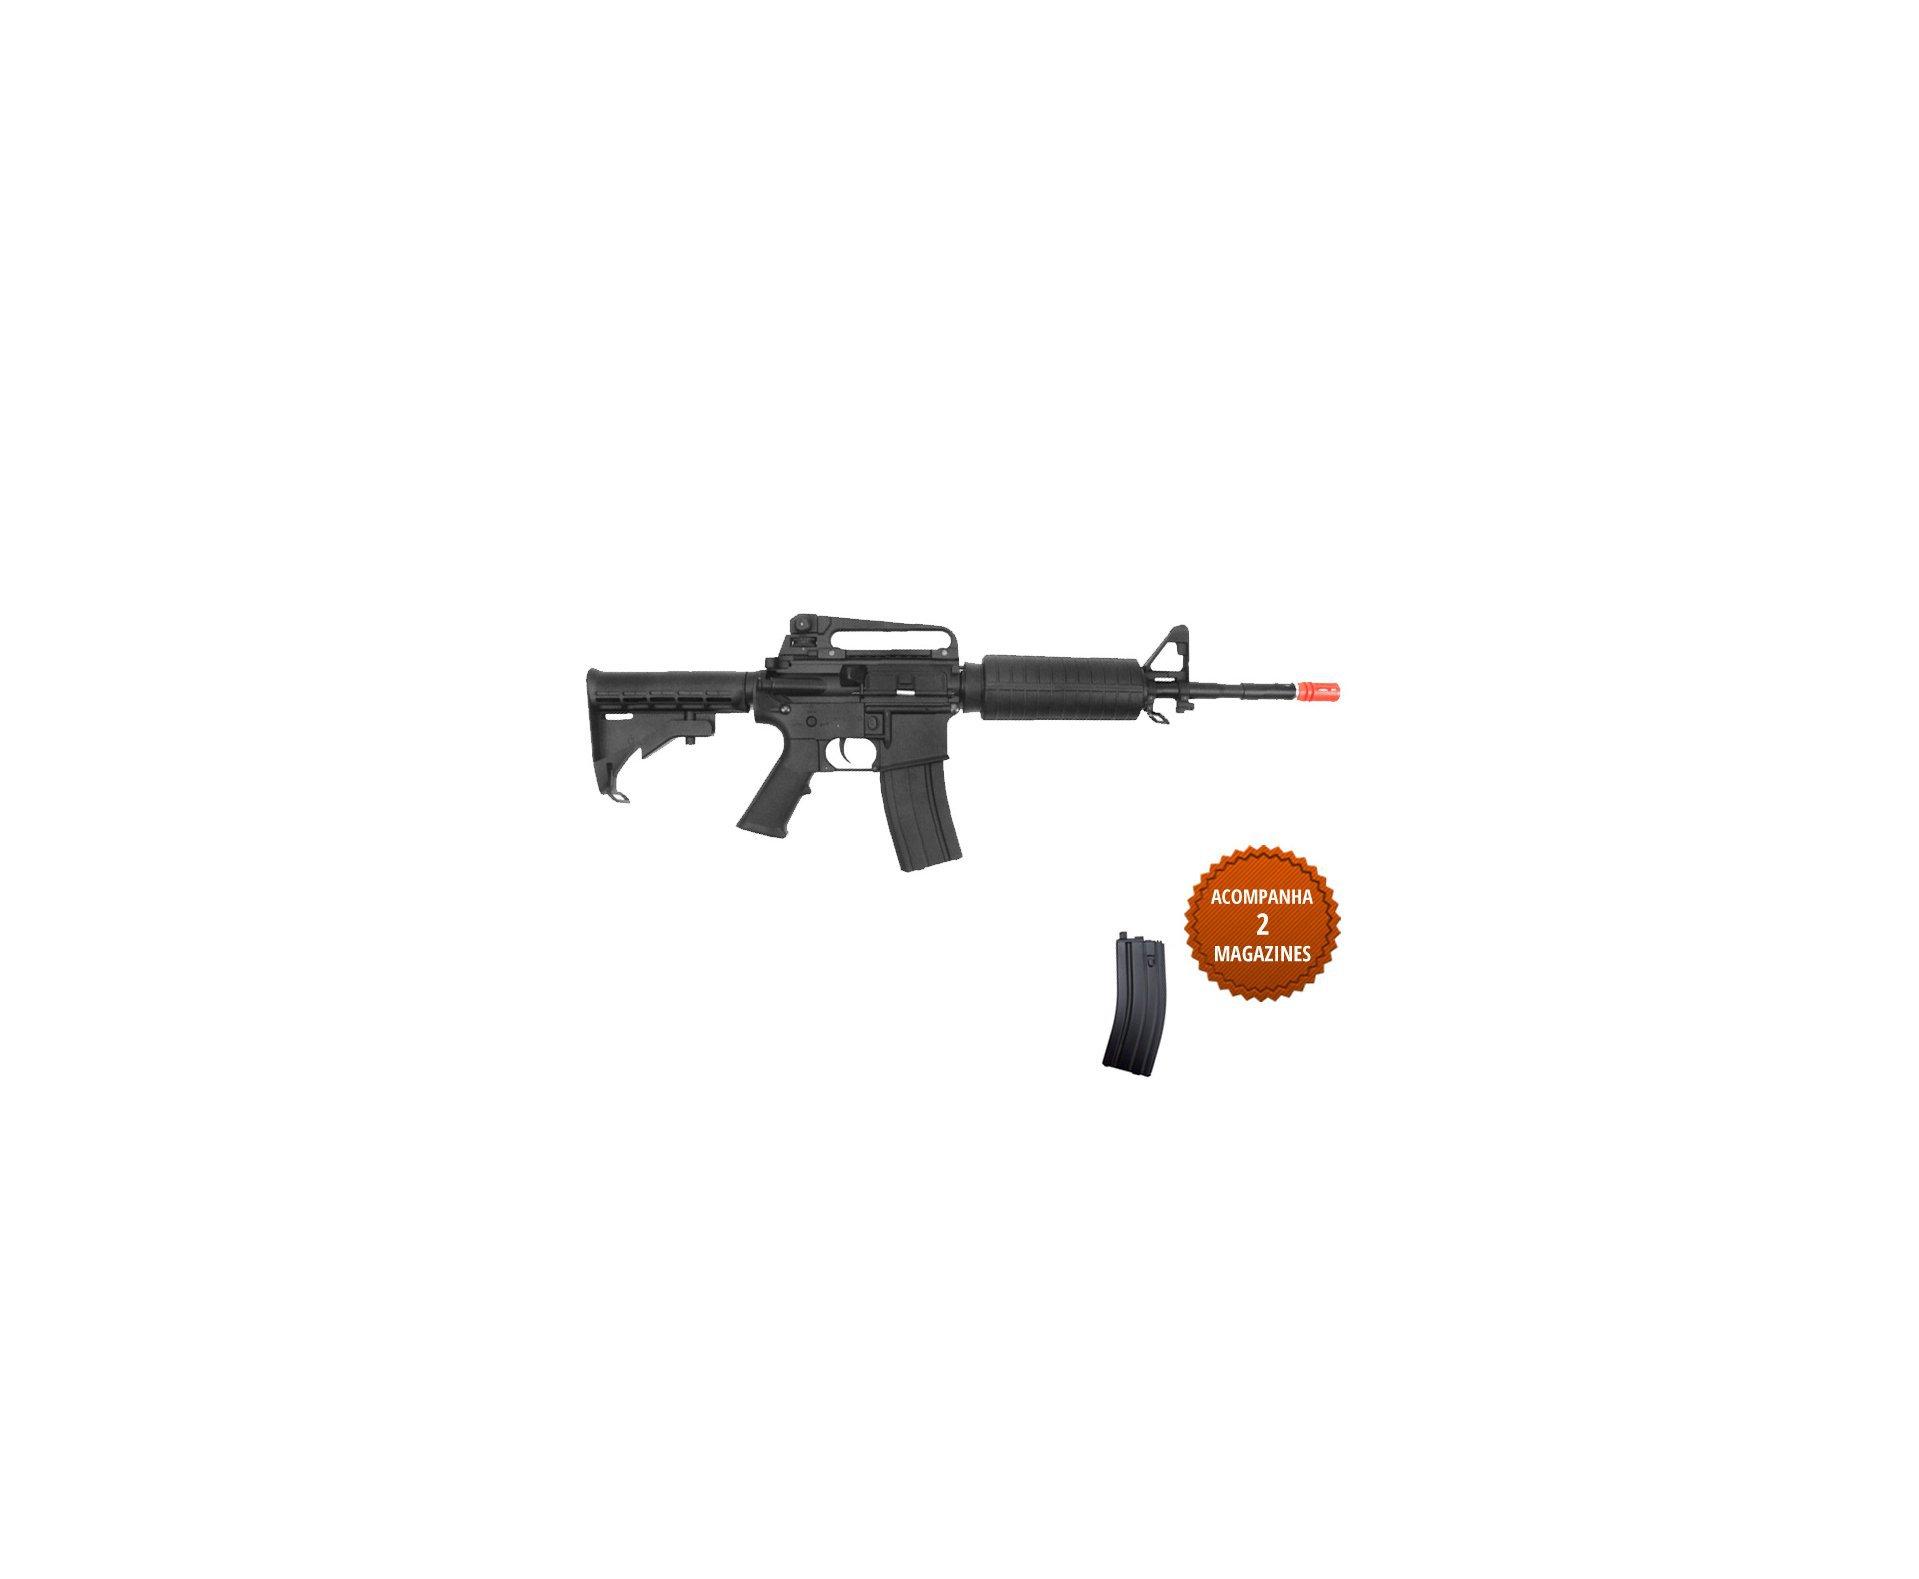 Rifle De Airsoft Colt M4a1 Carbine Semi/metal - Aeg - Cal 6,0 Mm (cyber Gun) + Pistola Glock Aeg Bivolt + Capa Hunter